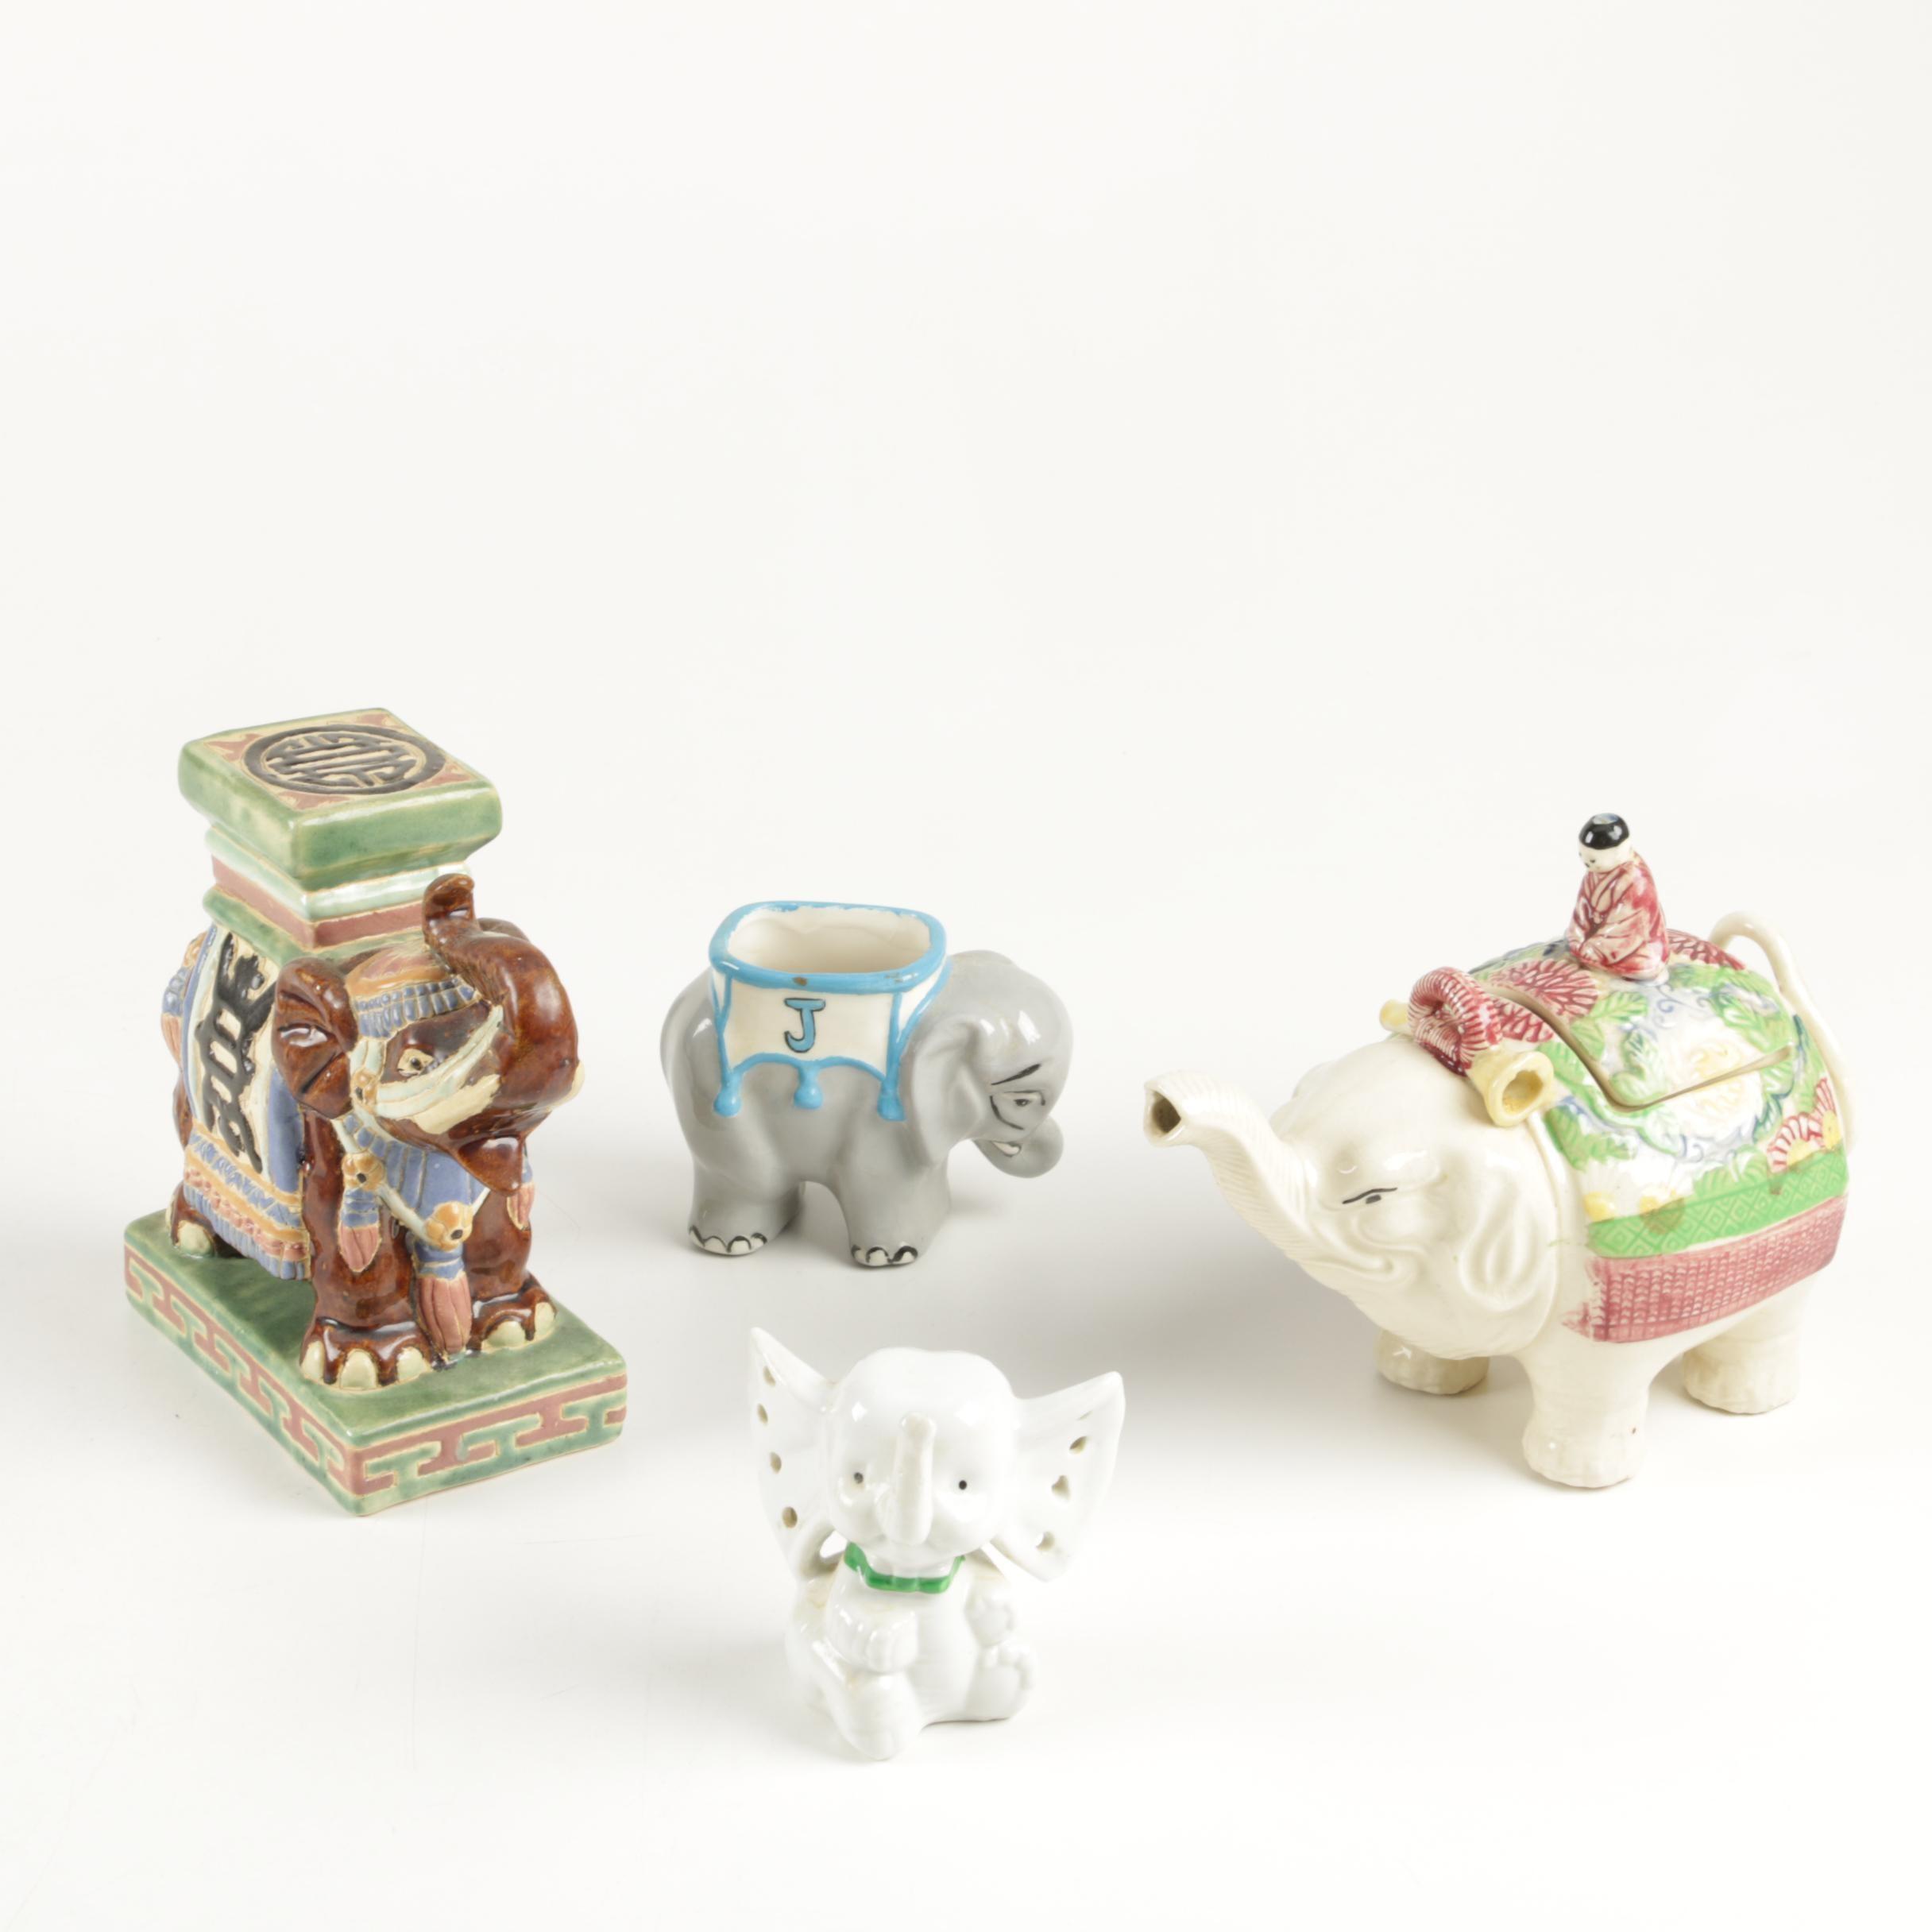 Vintage Elephant Themed Ceramic Assortment